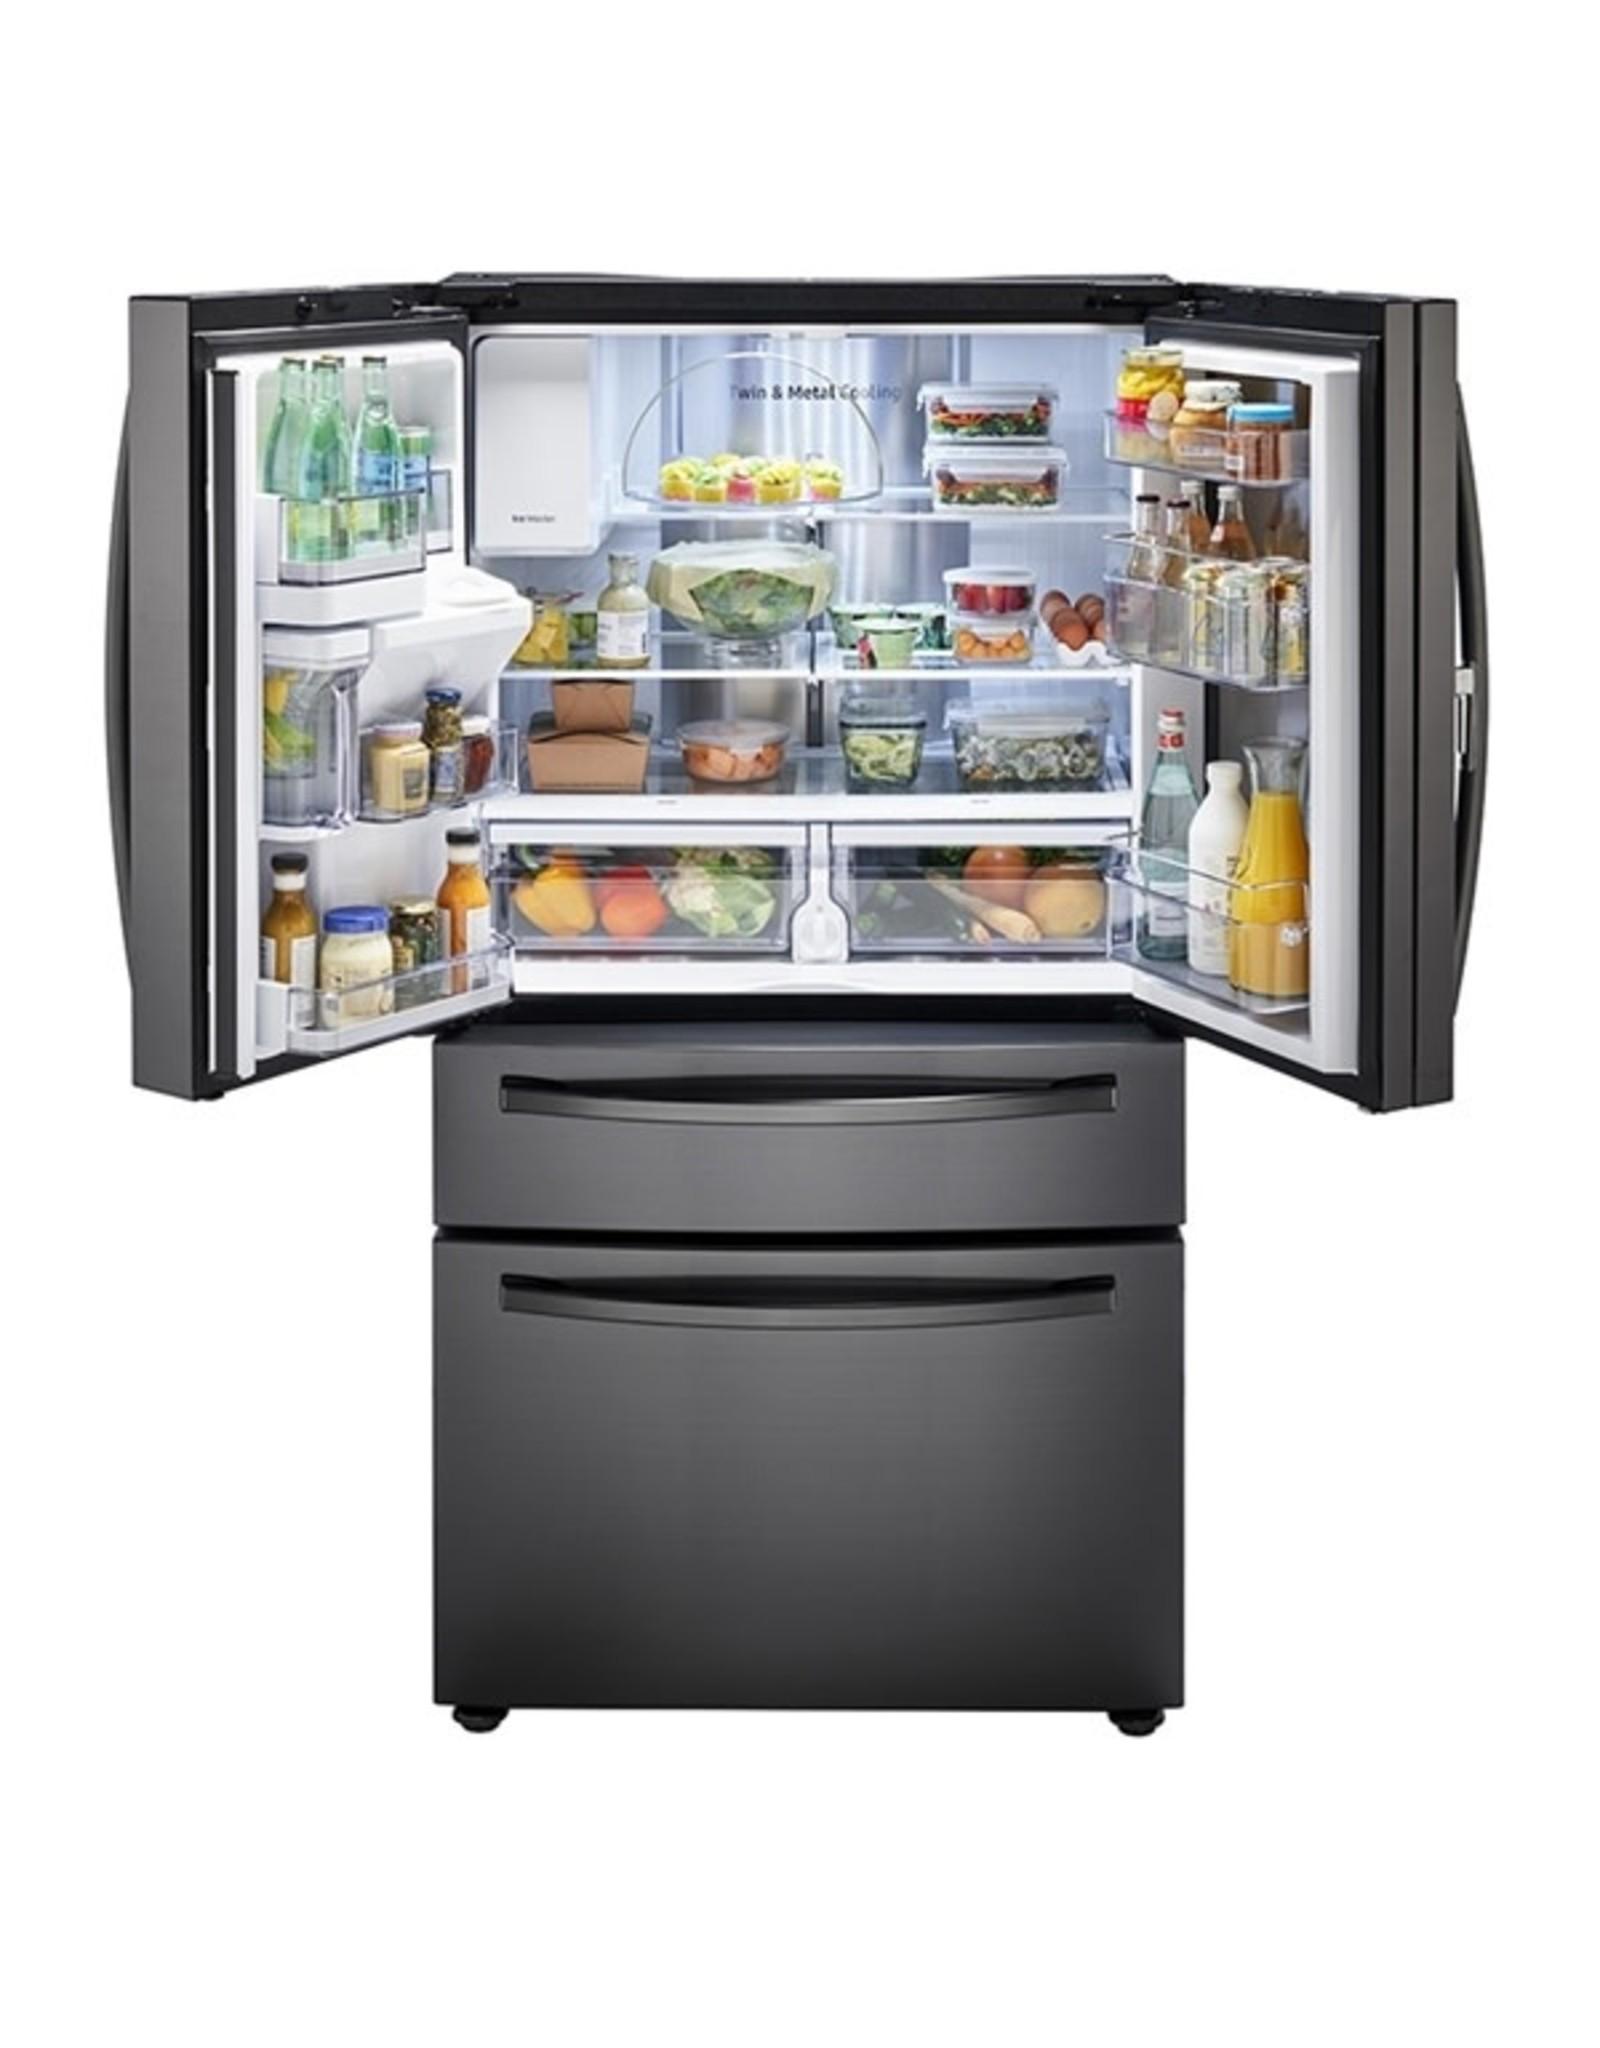 SAMSUNG customer return RF28R7351SG Samsung food showcase 28 cu.ft 4- D French-D refrigerator with ice maker